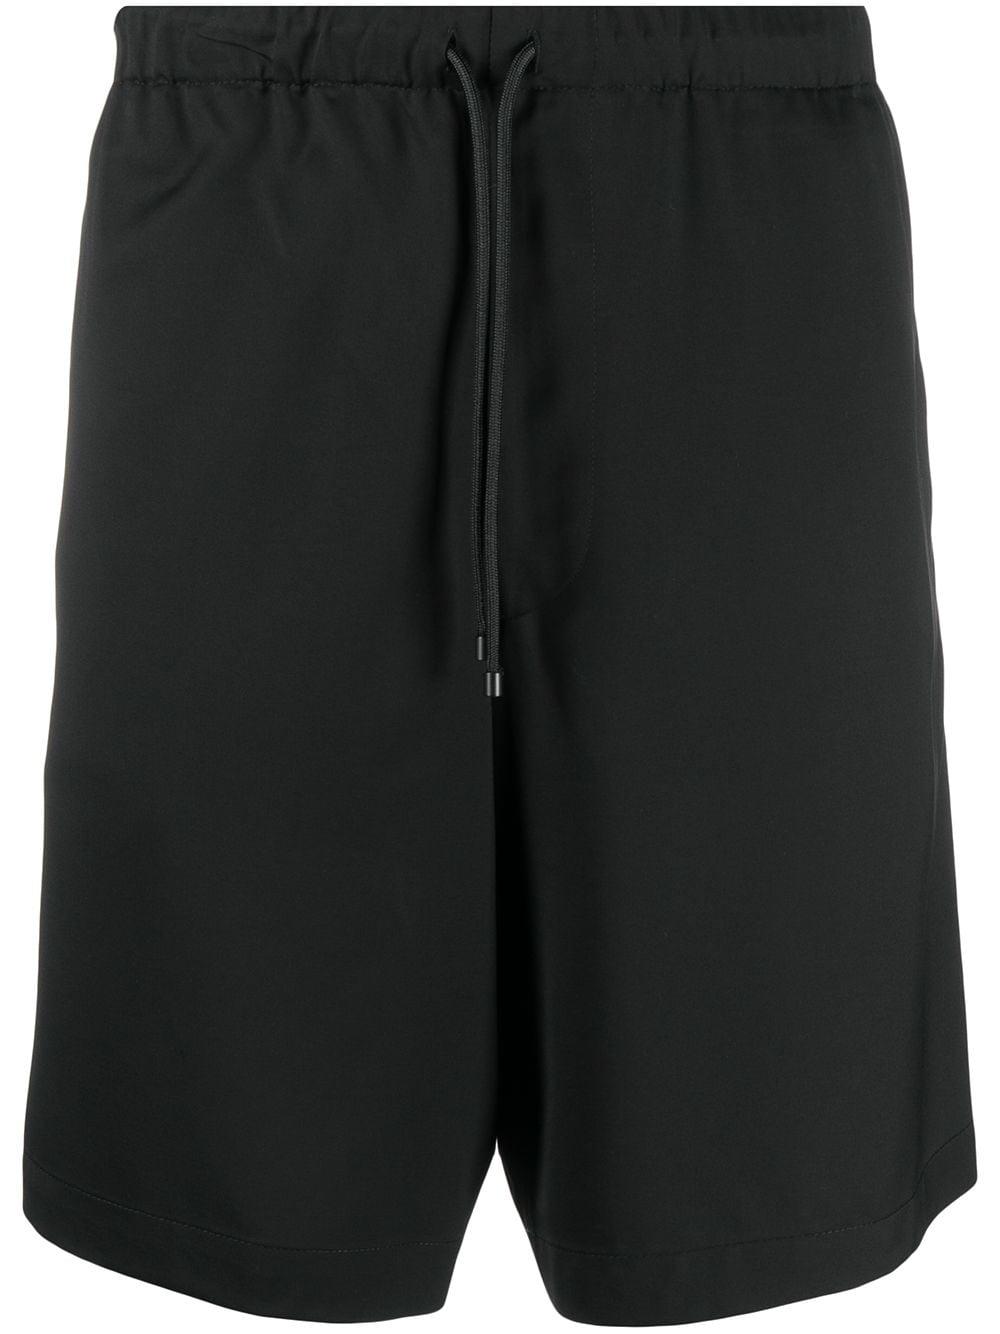 Shorts con elastico in vita DRIES VAN NOTEN | Shorts | PIPERI2119900